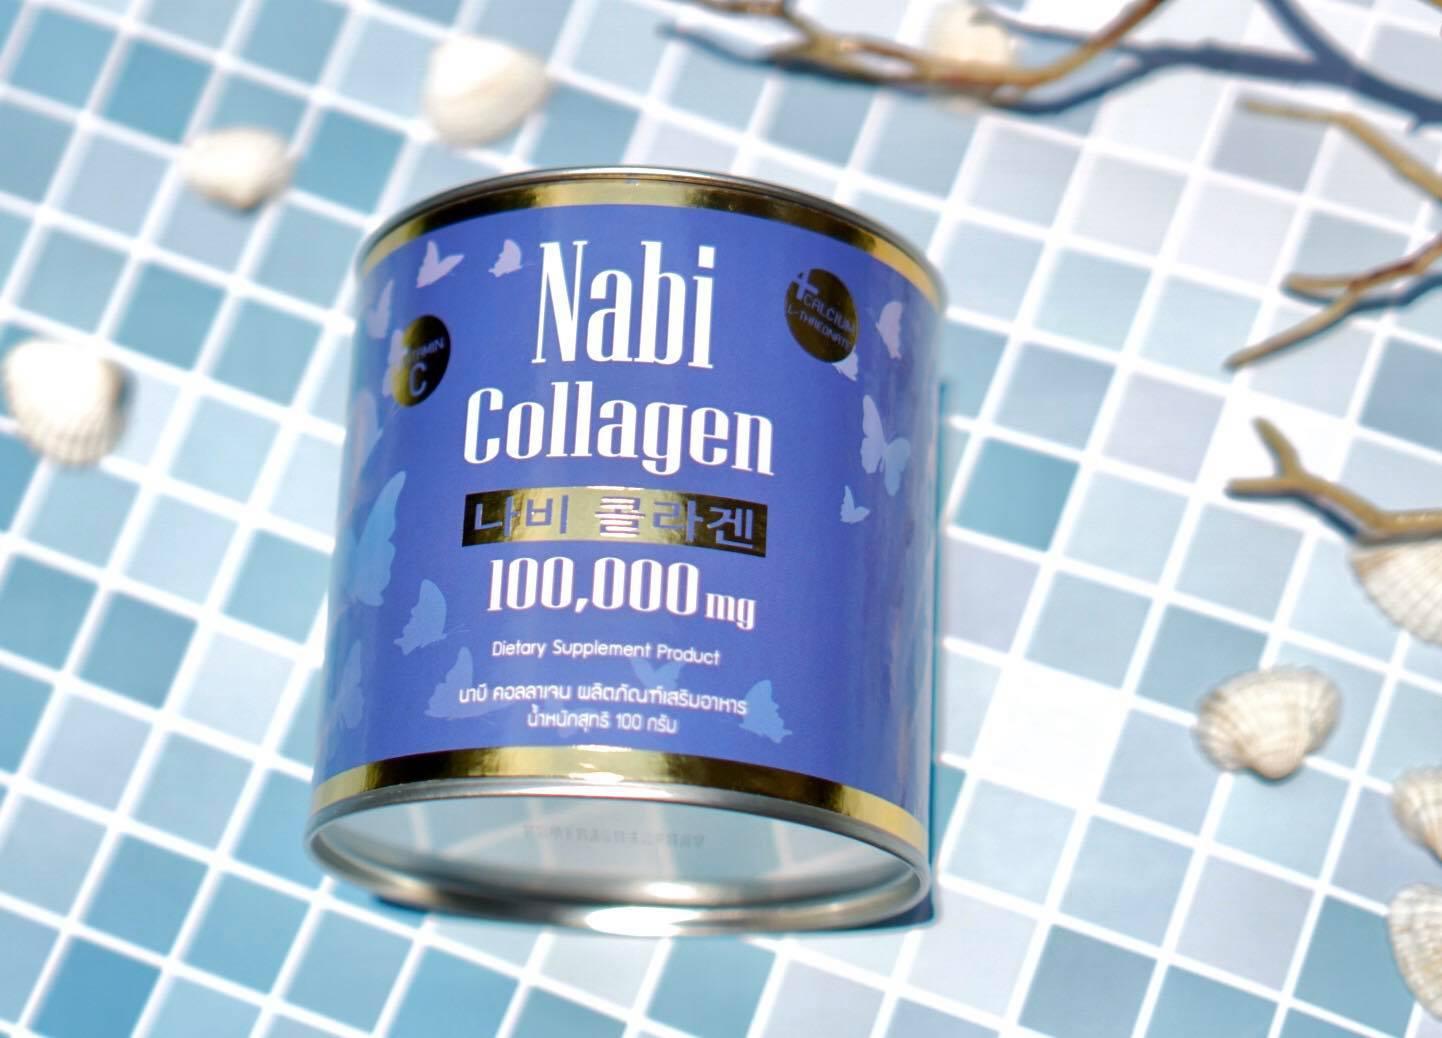 nabi Collagen ดีอย่างไร